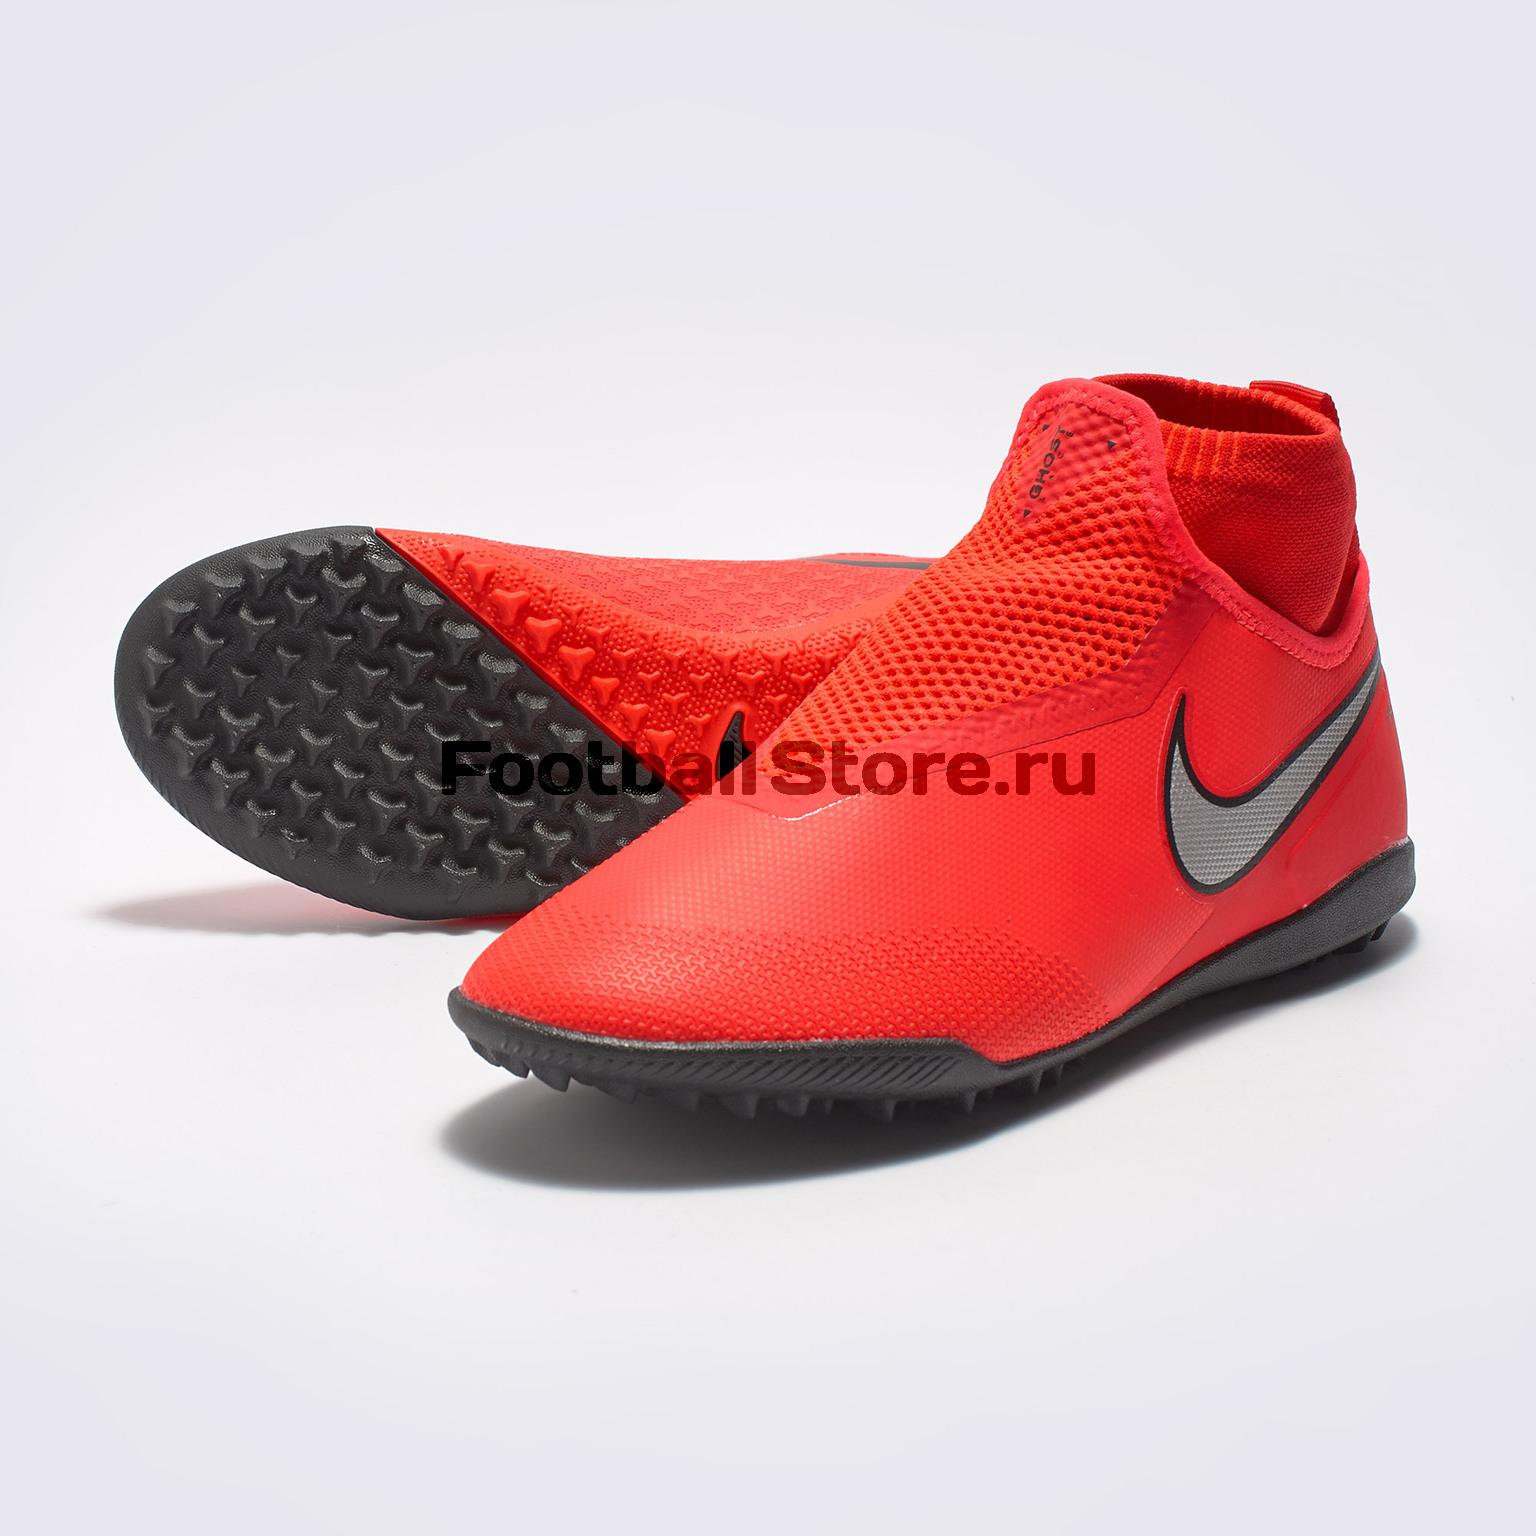 Шиповки Nike React Phantom Vision Pro DF TF AO3277-600 бутсы детские nike phantom vision academy df sg aq9298 400